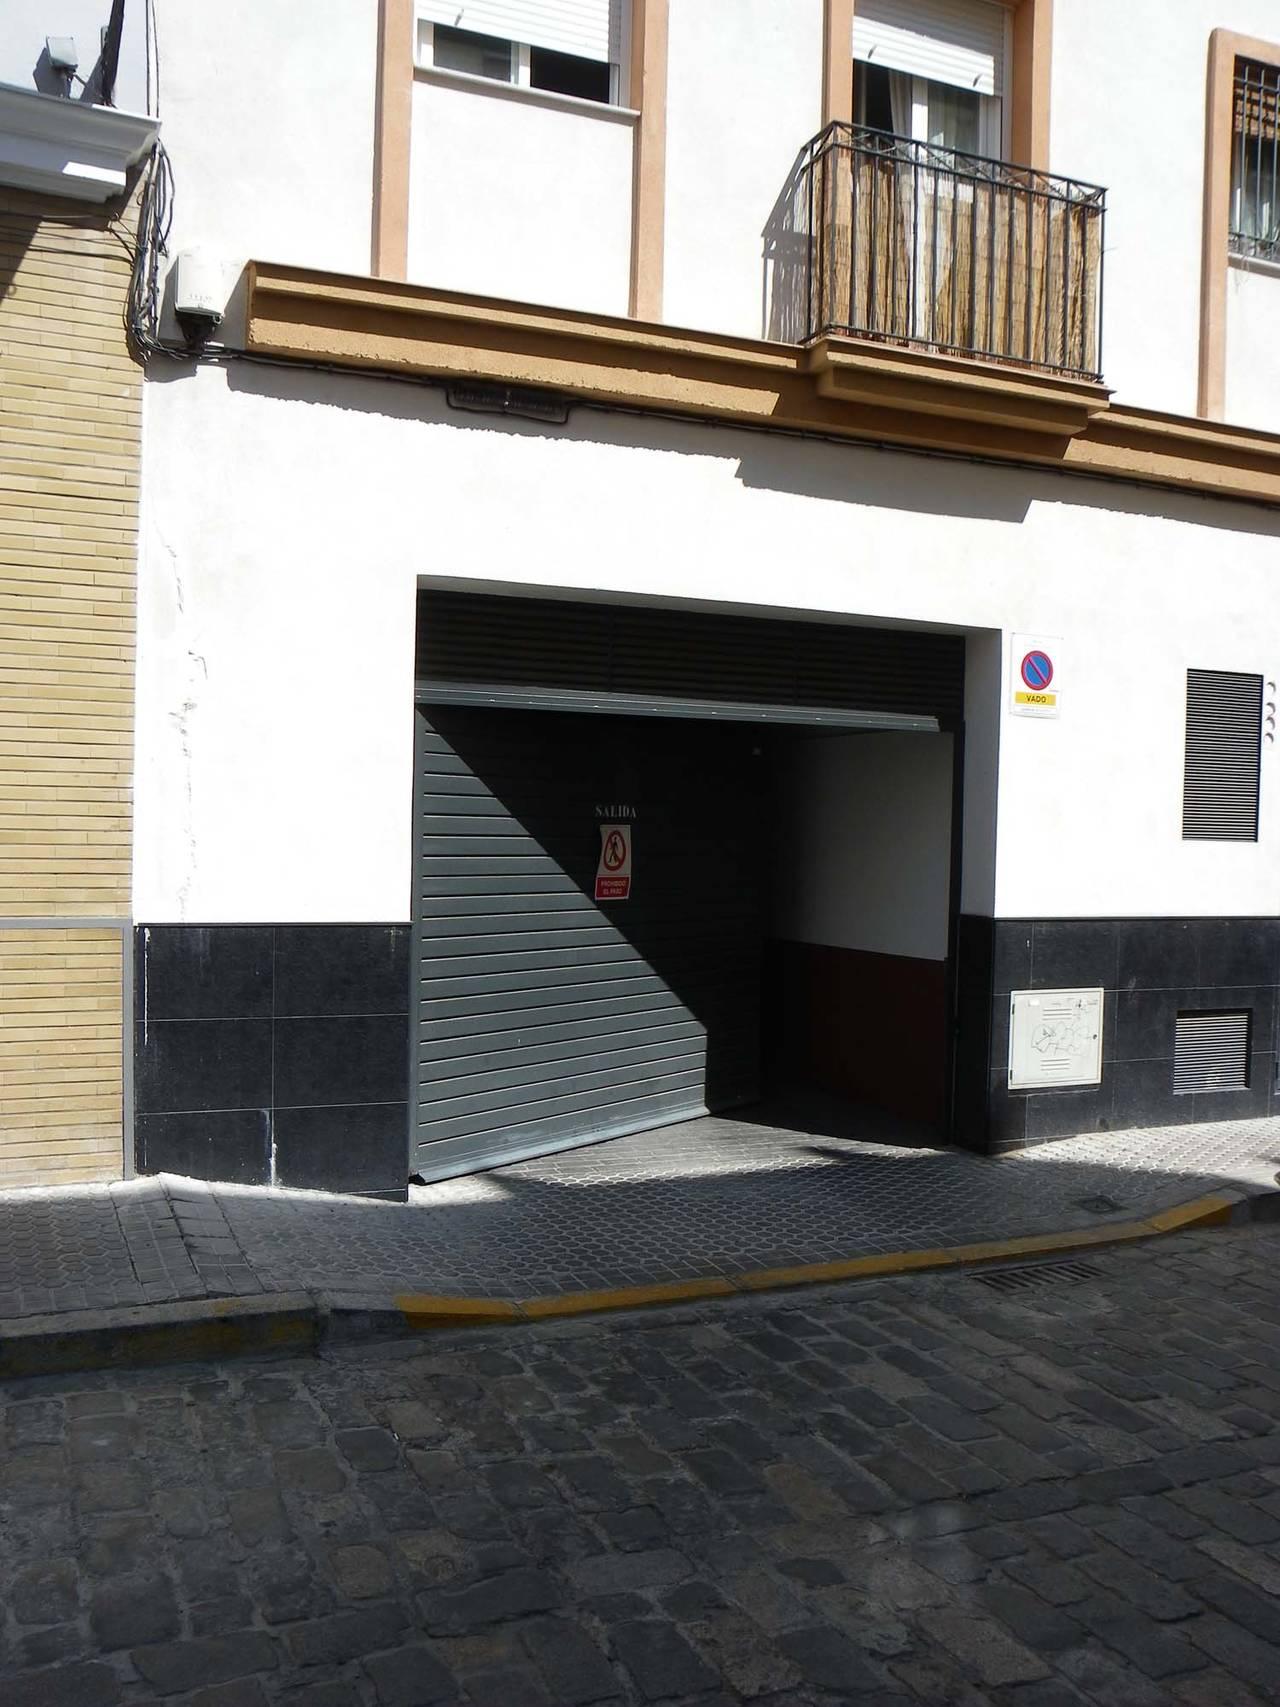 Amplia plaza de GARAJE + trastero en el Centro  (Zona S. Lorenzo)  - Foto 3